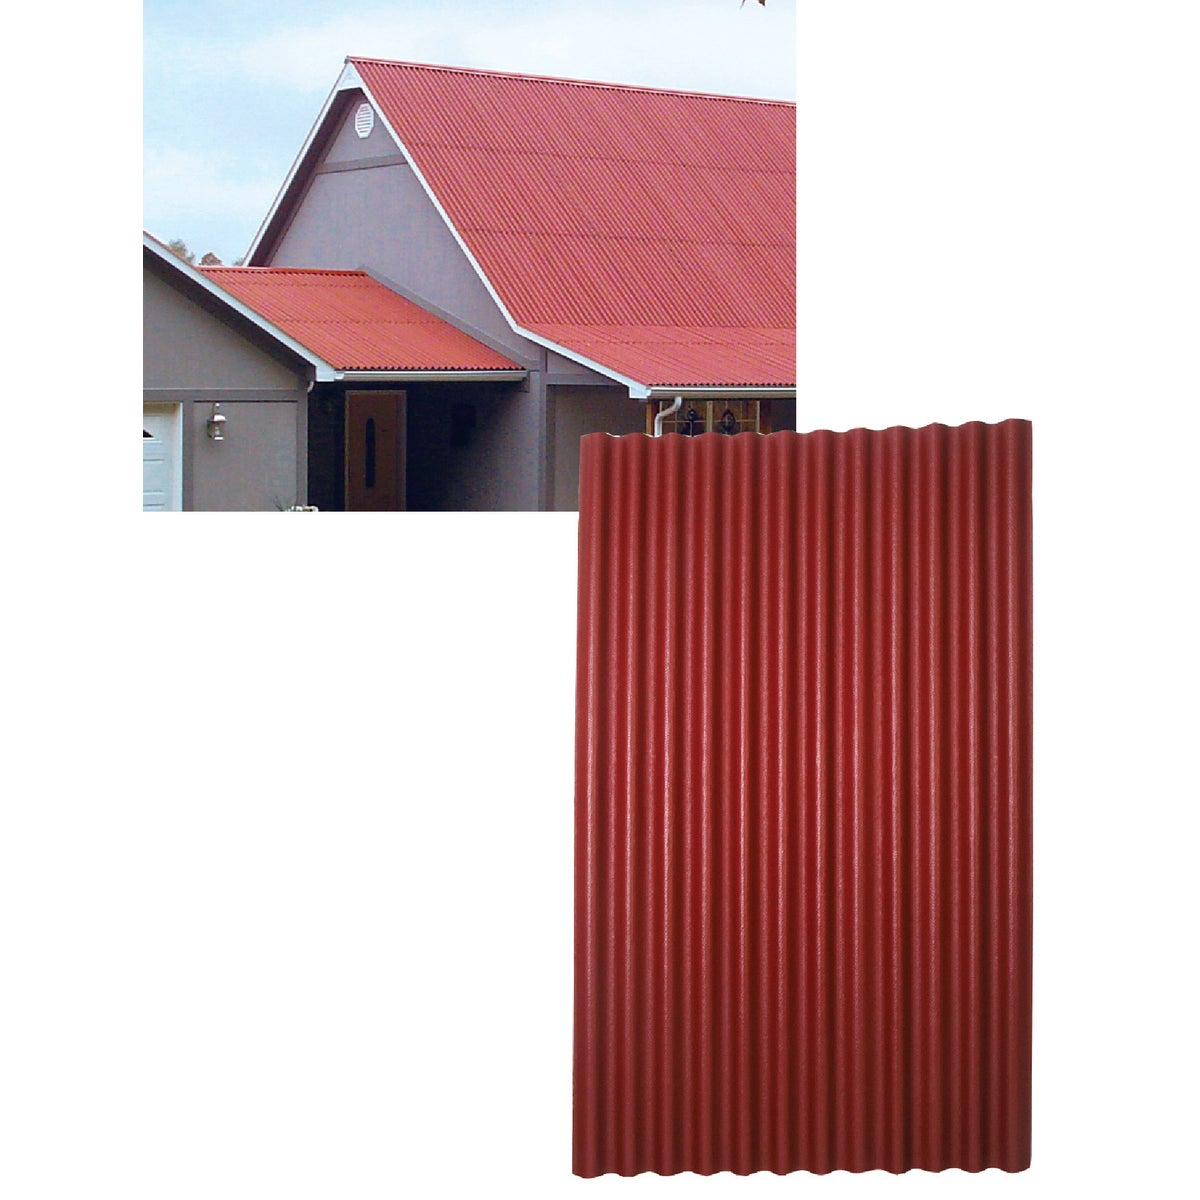 Ondura Corrugated Roofing Panels